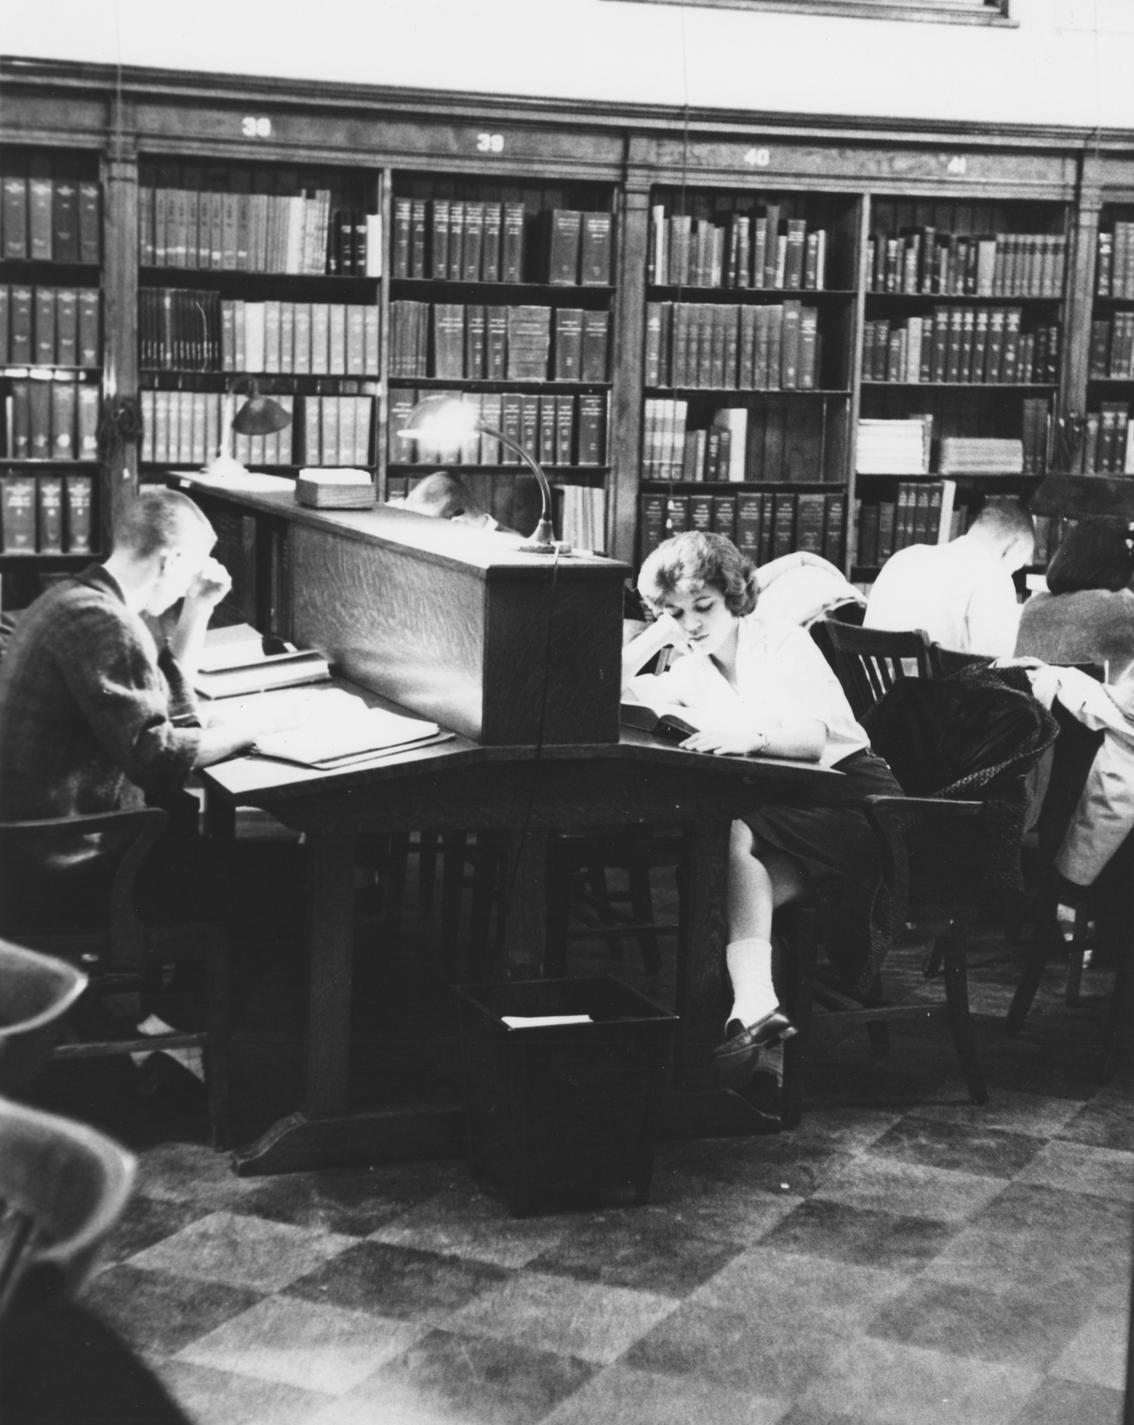 Students study at King Library circa 1966. Photo from Explore UK.